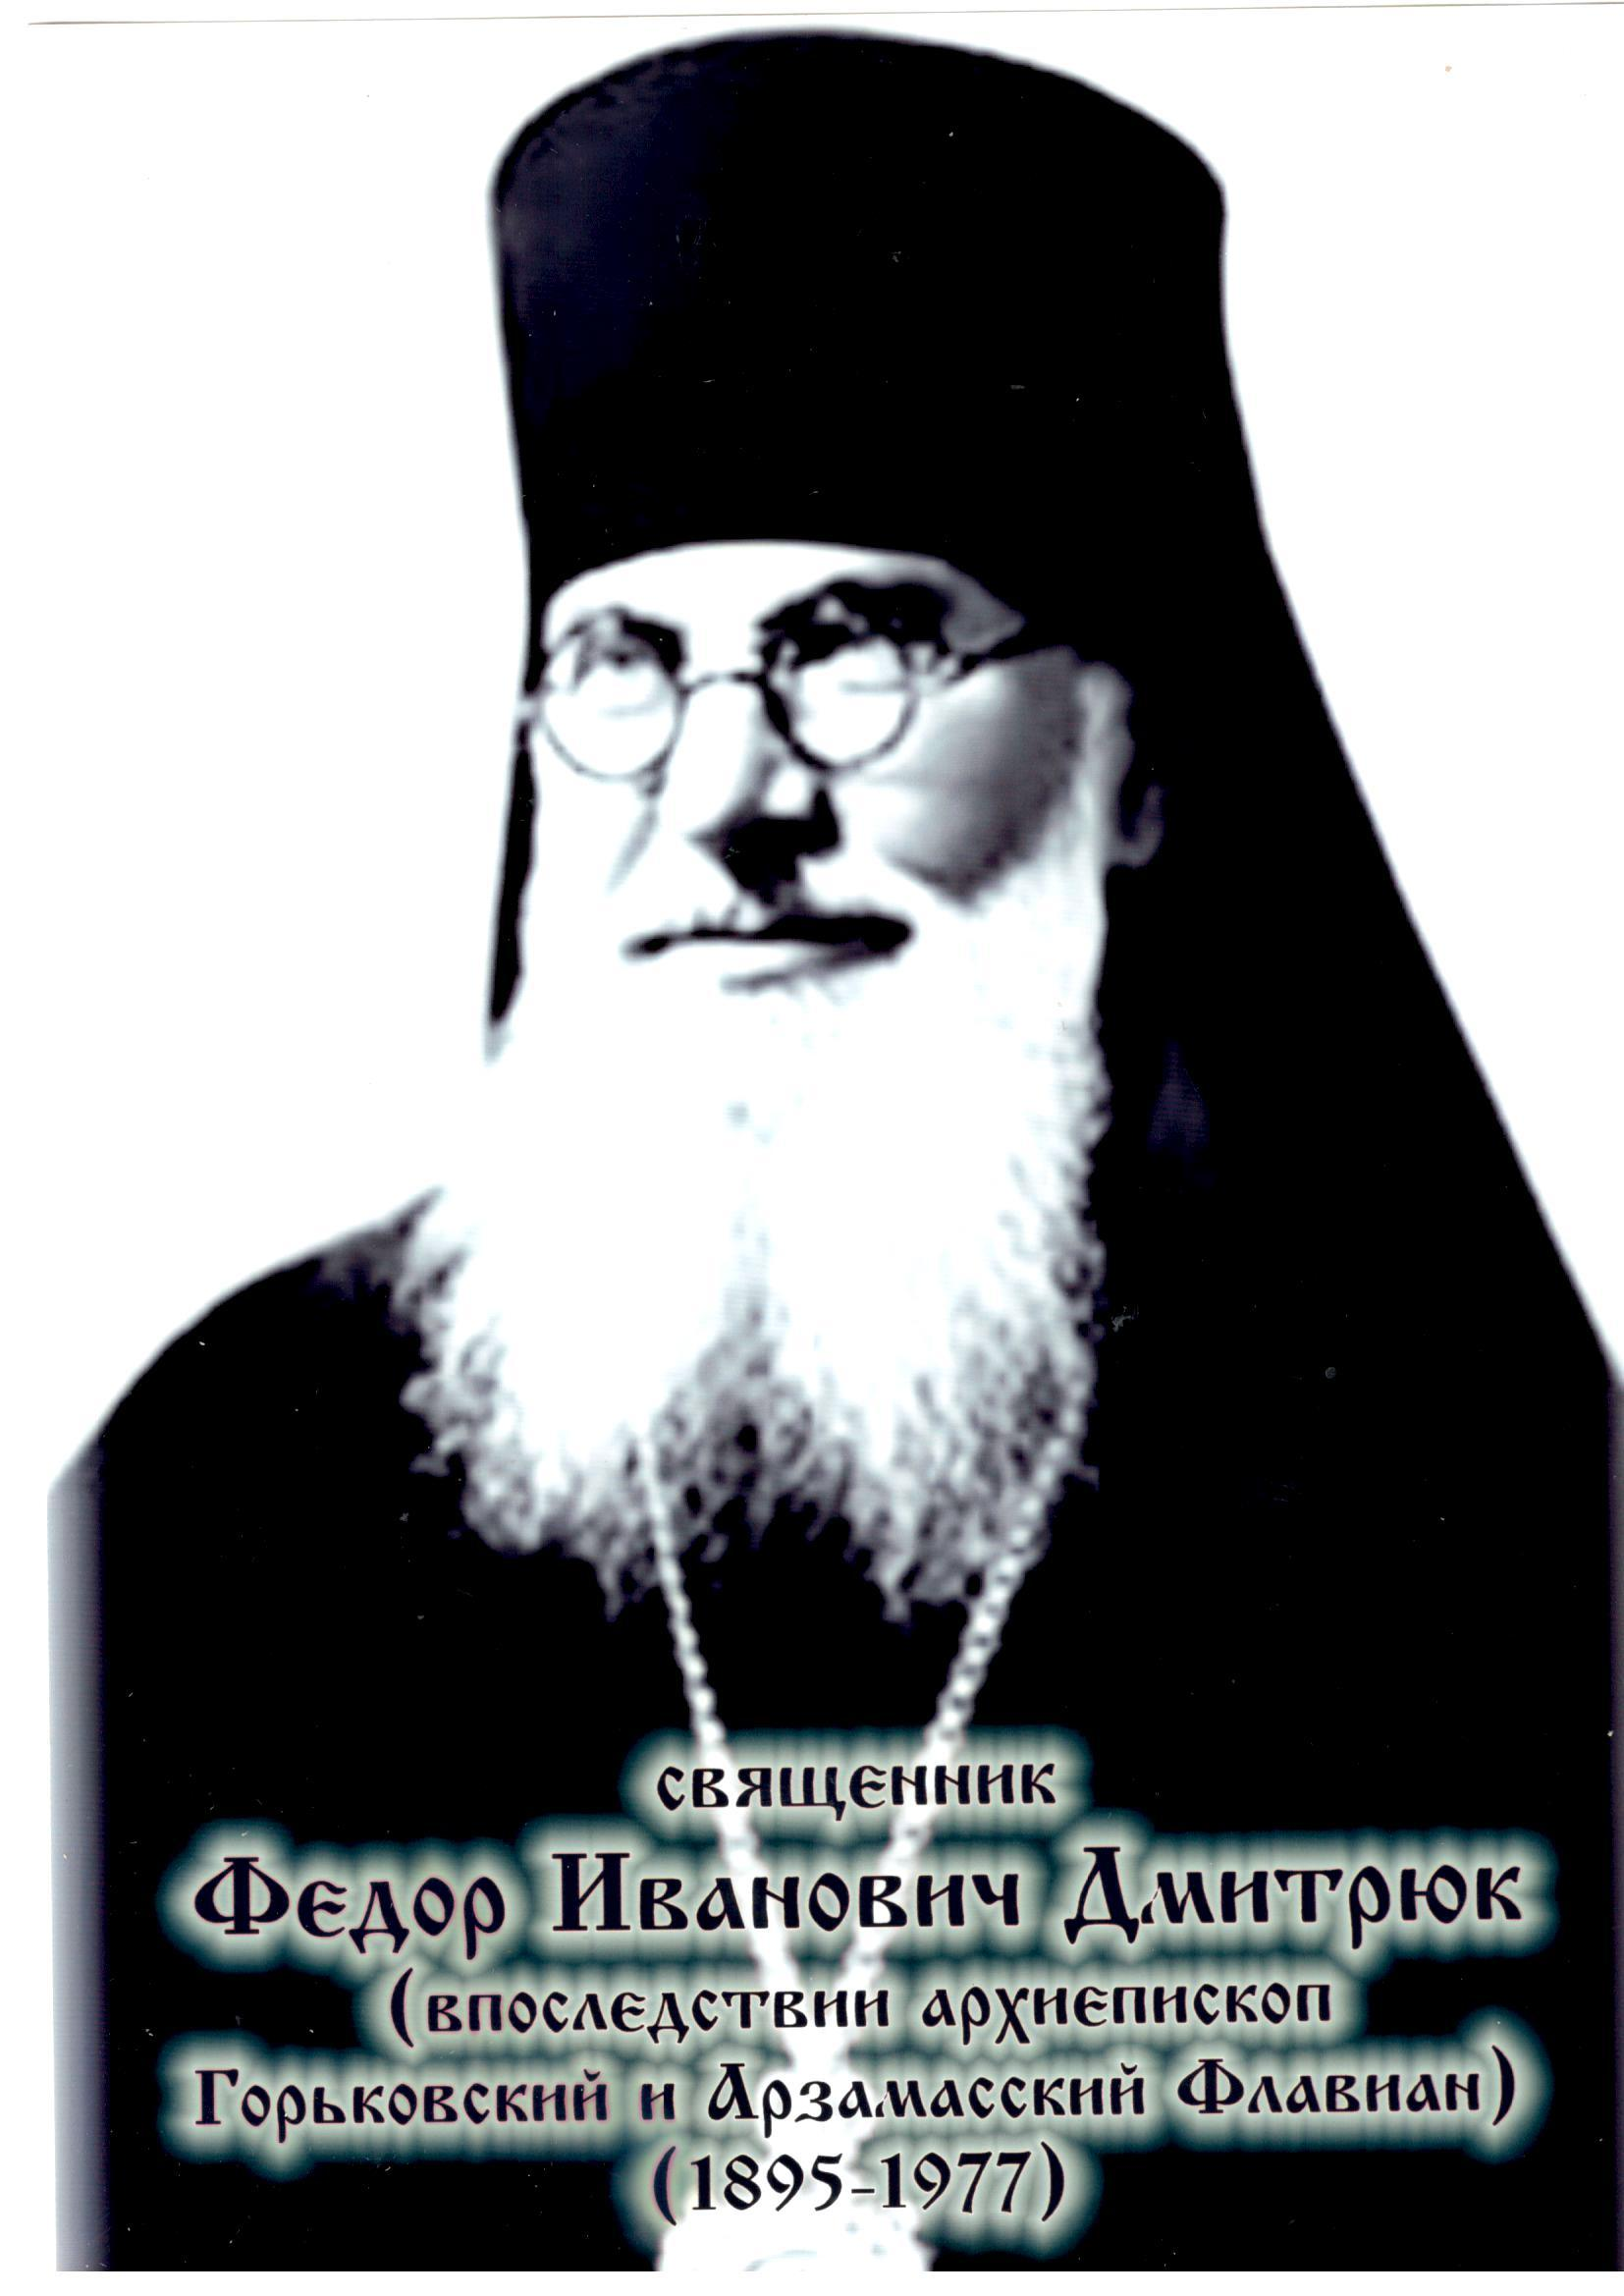 Архиепископ Горьковский Флавиан (Дмитрюк)